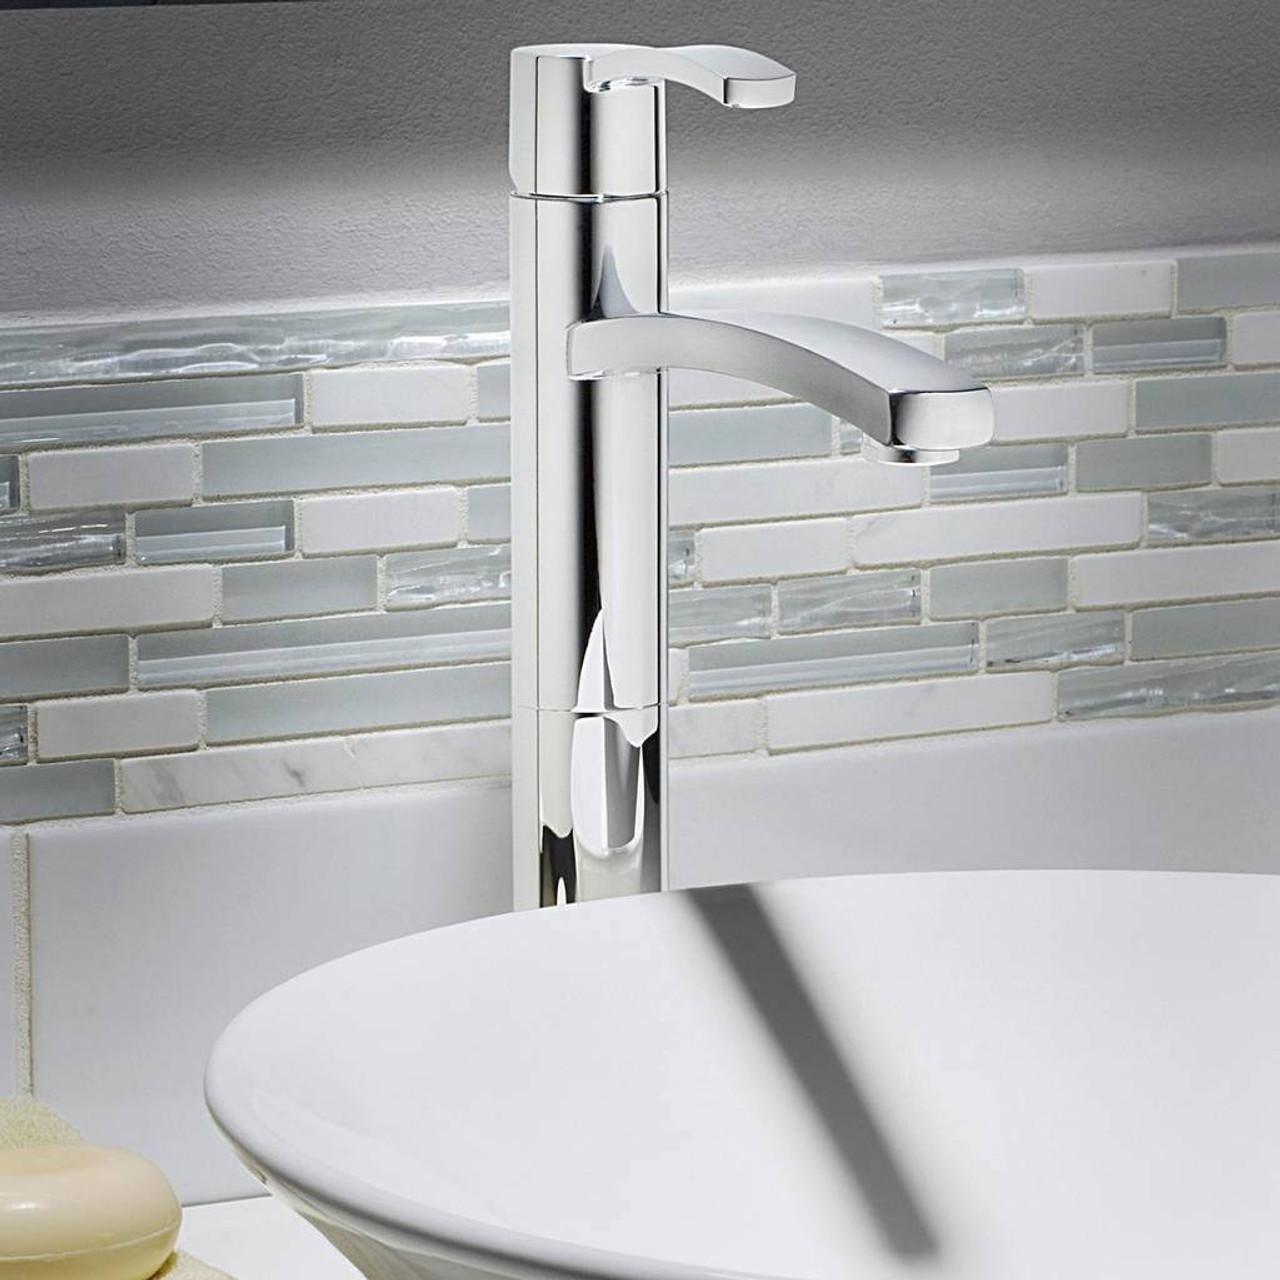 American Standard Boulevard Vessel Sink Faucet Satin Nickel Finish